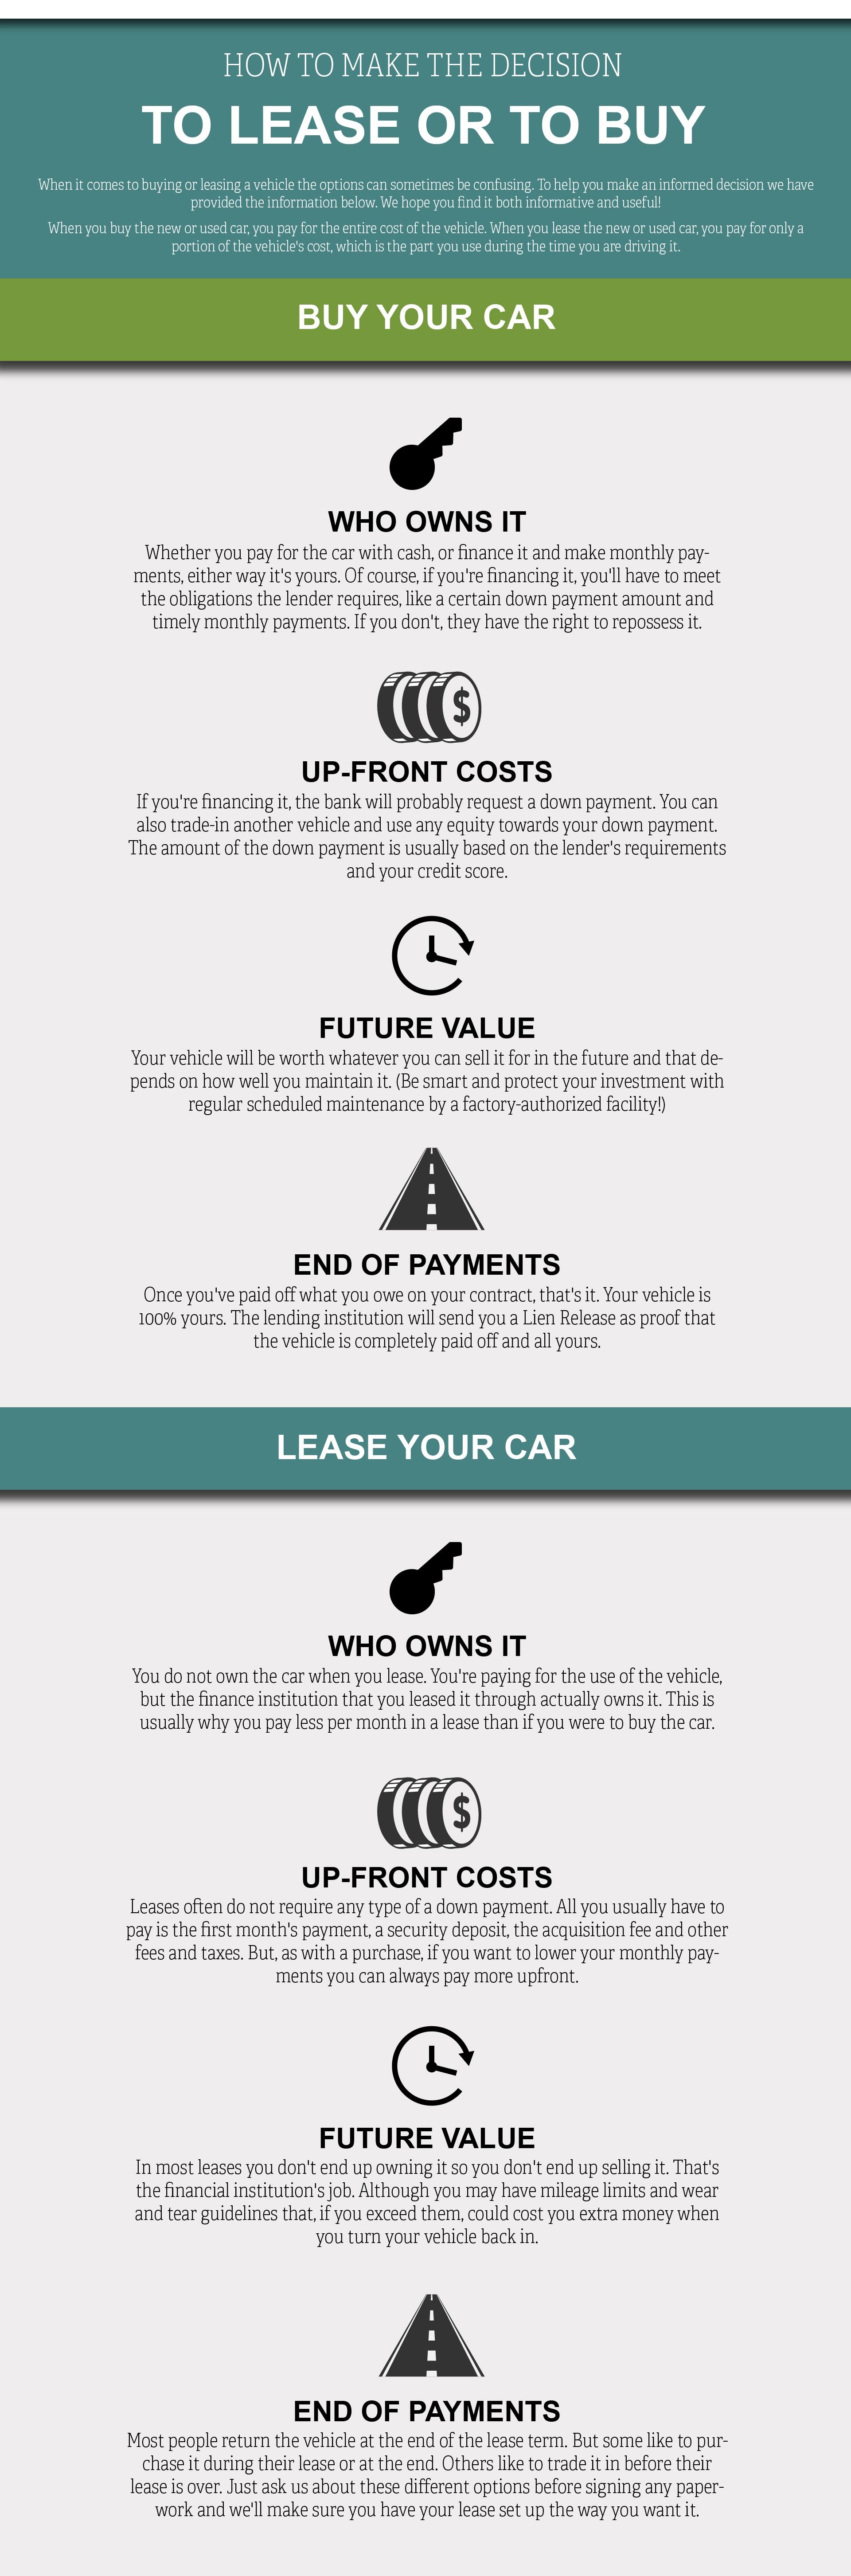 leasing vs buying car